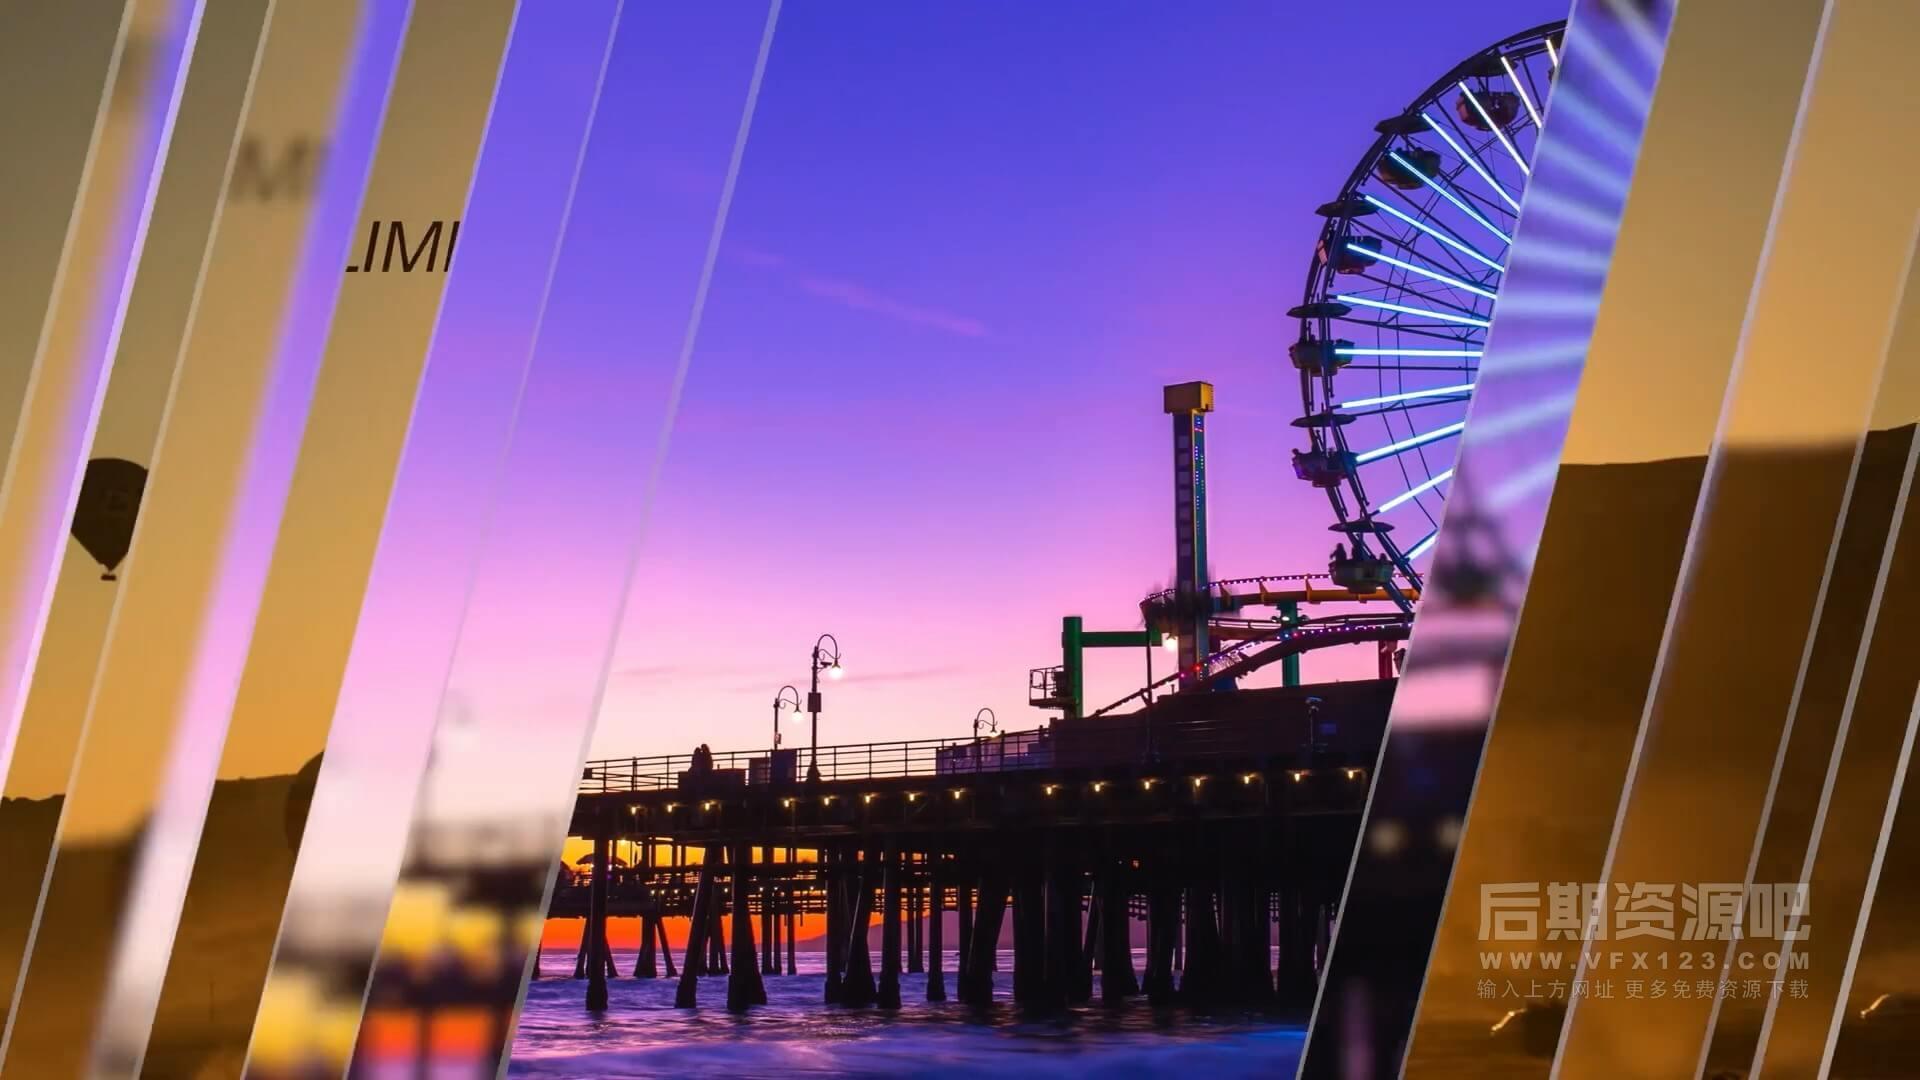 fcpx插件 玻璃质感过渡转场片头动画标题模板 支持M1 Glass Slideshow